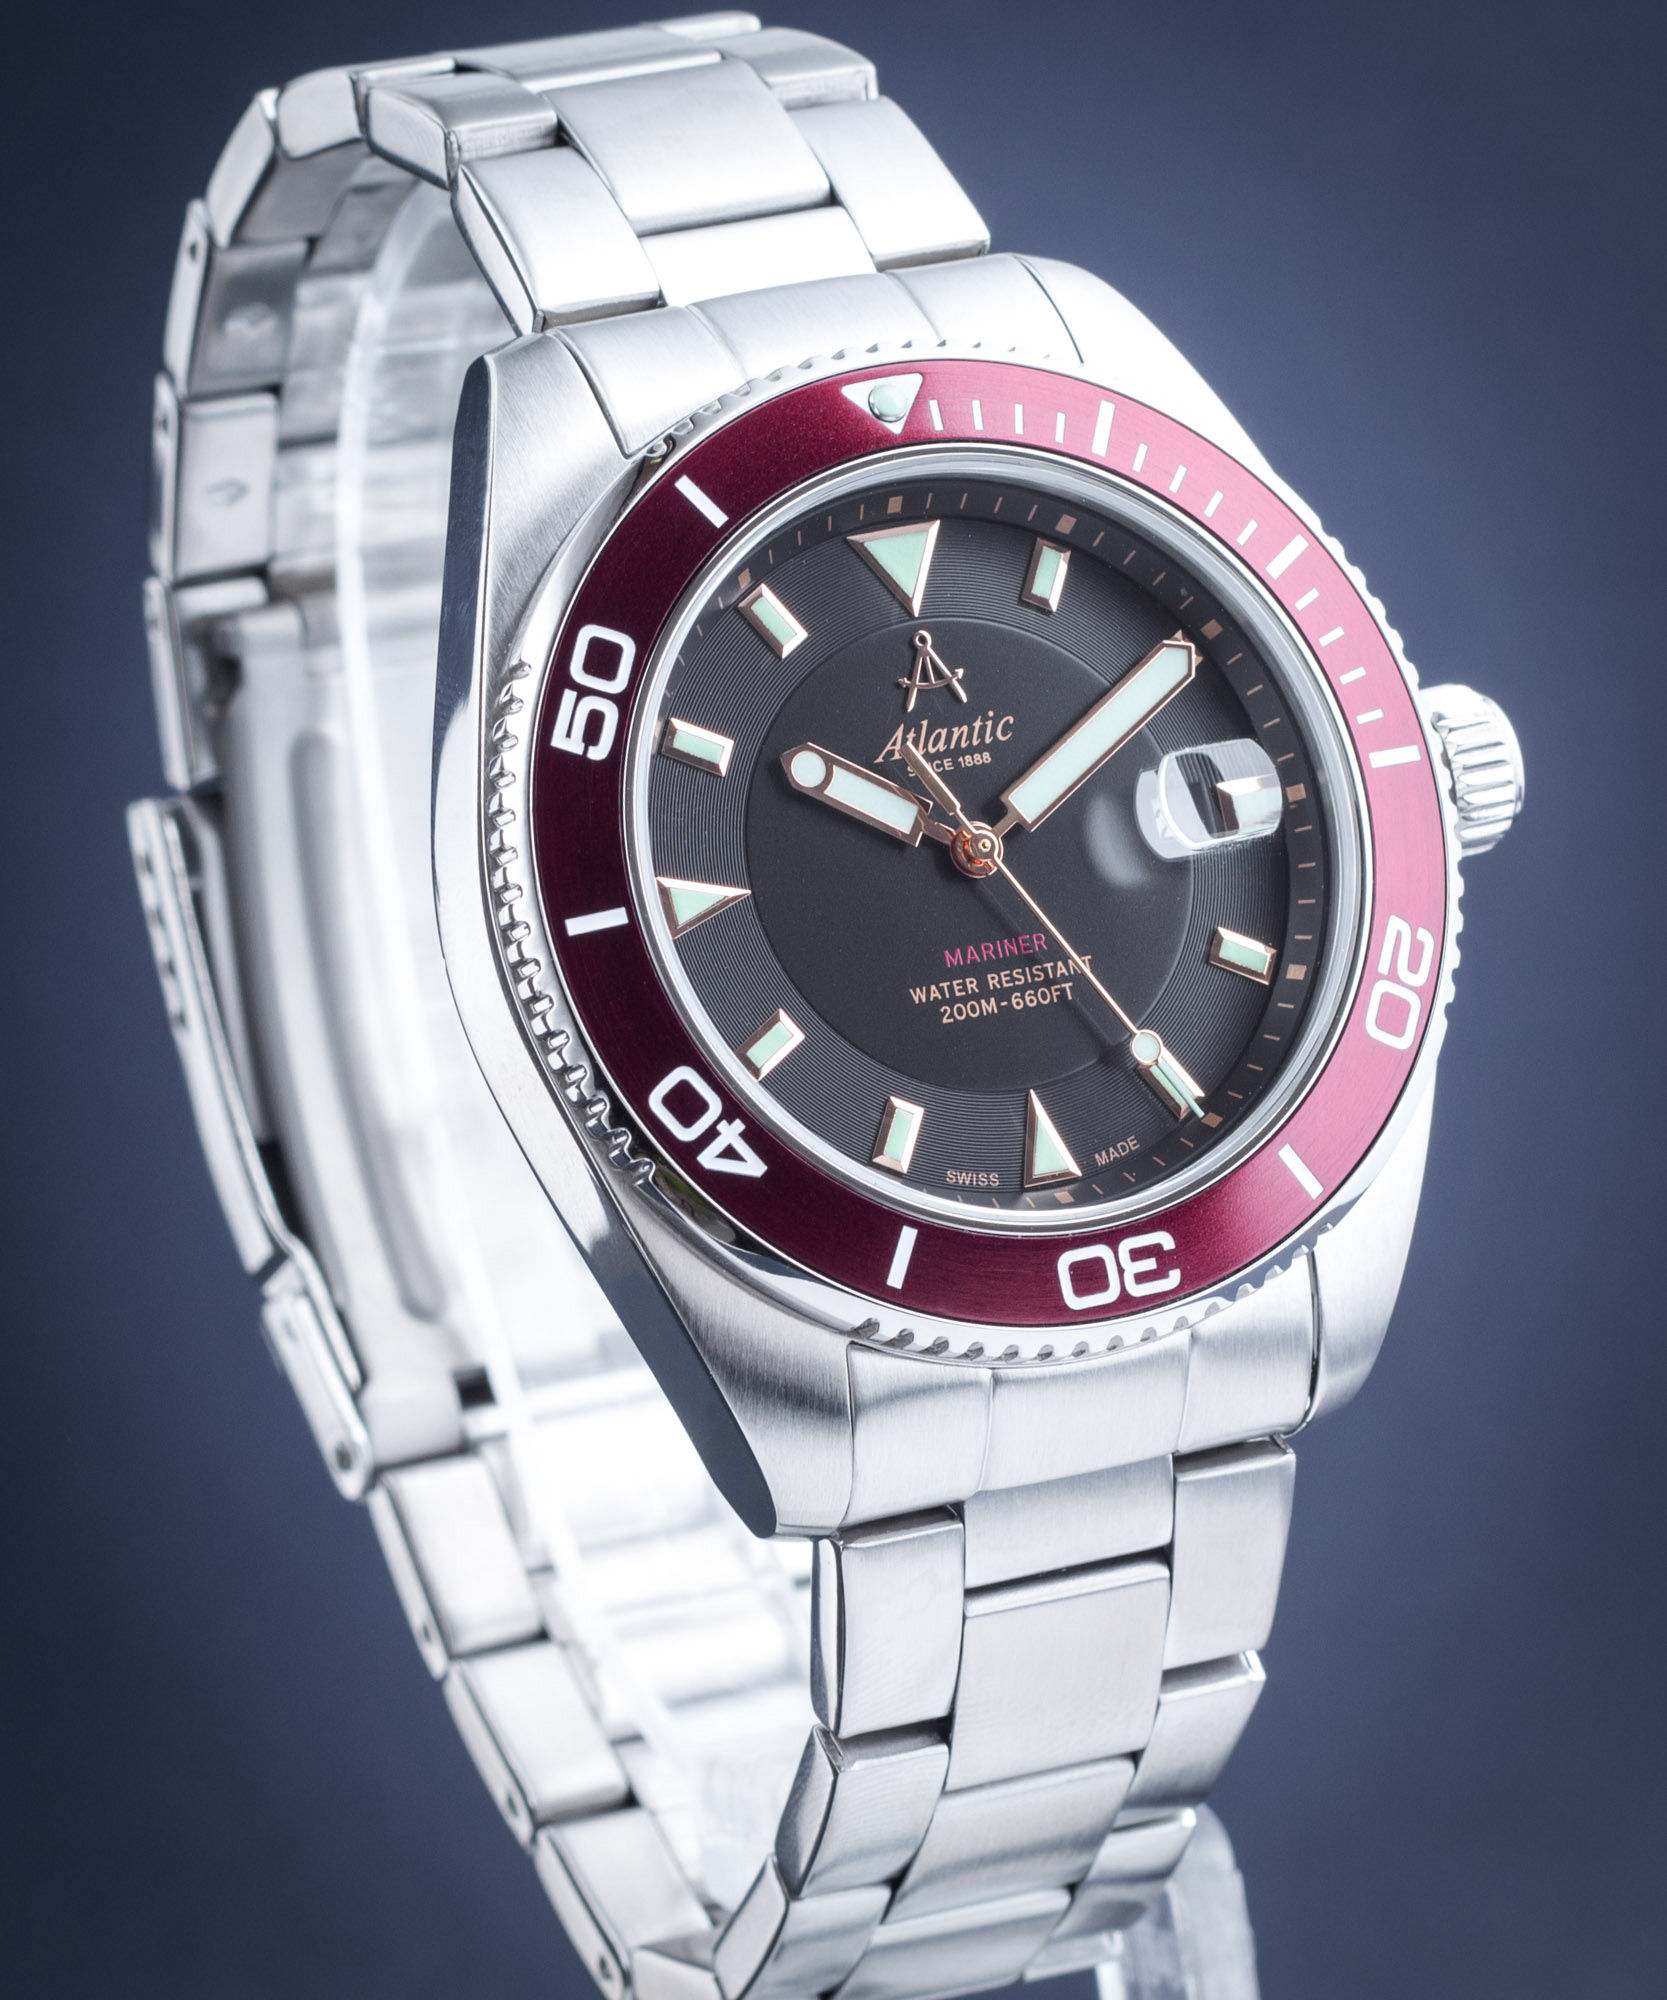 Zegarek męski Atlantic Mariner